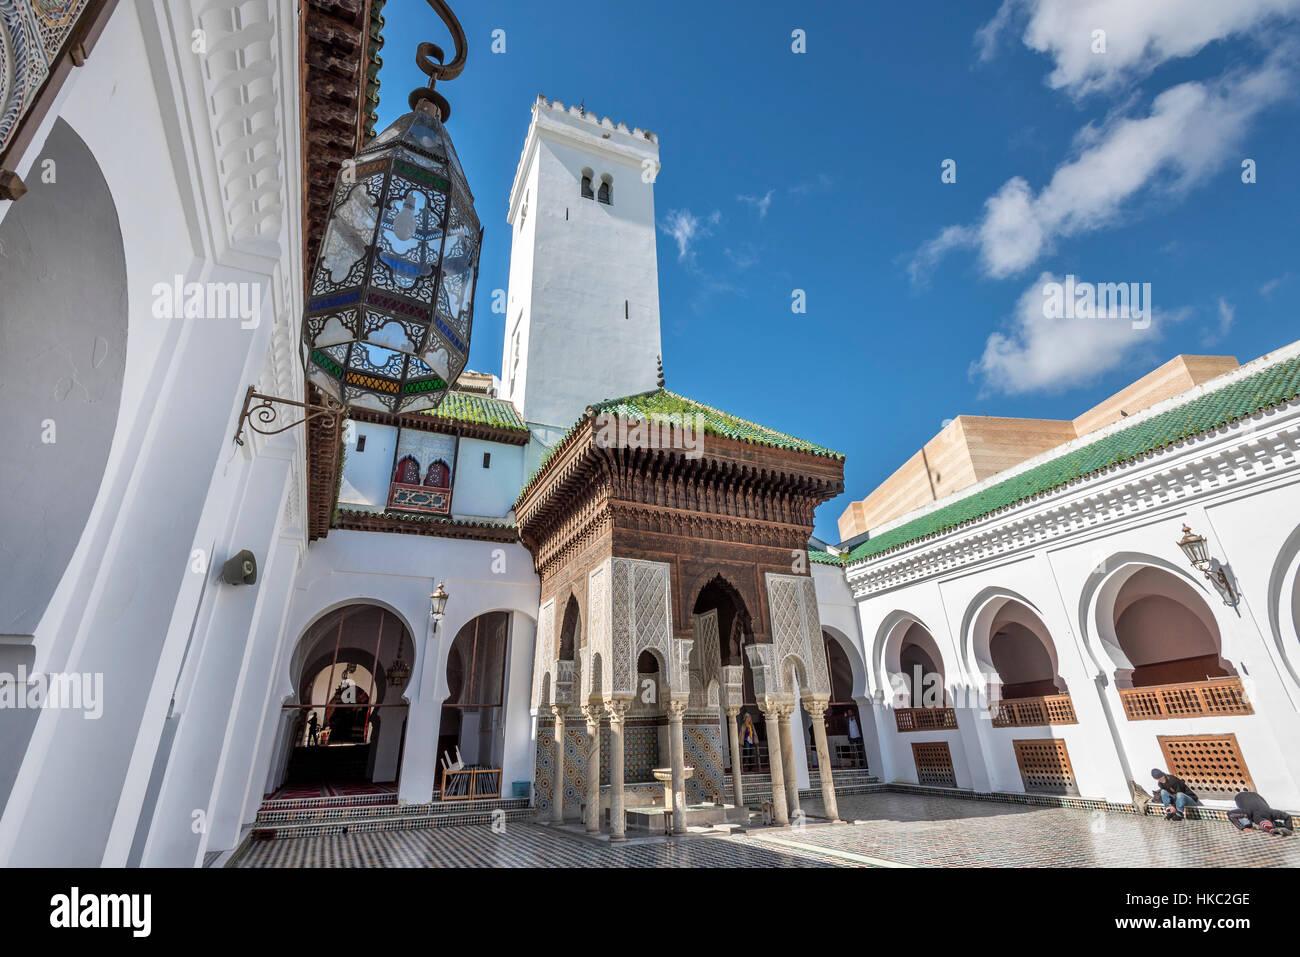 Al-Qarawiyyin Mosque and university Fes Morocco Stock Photo